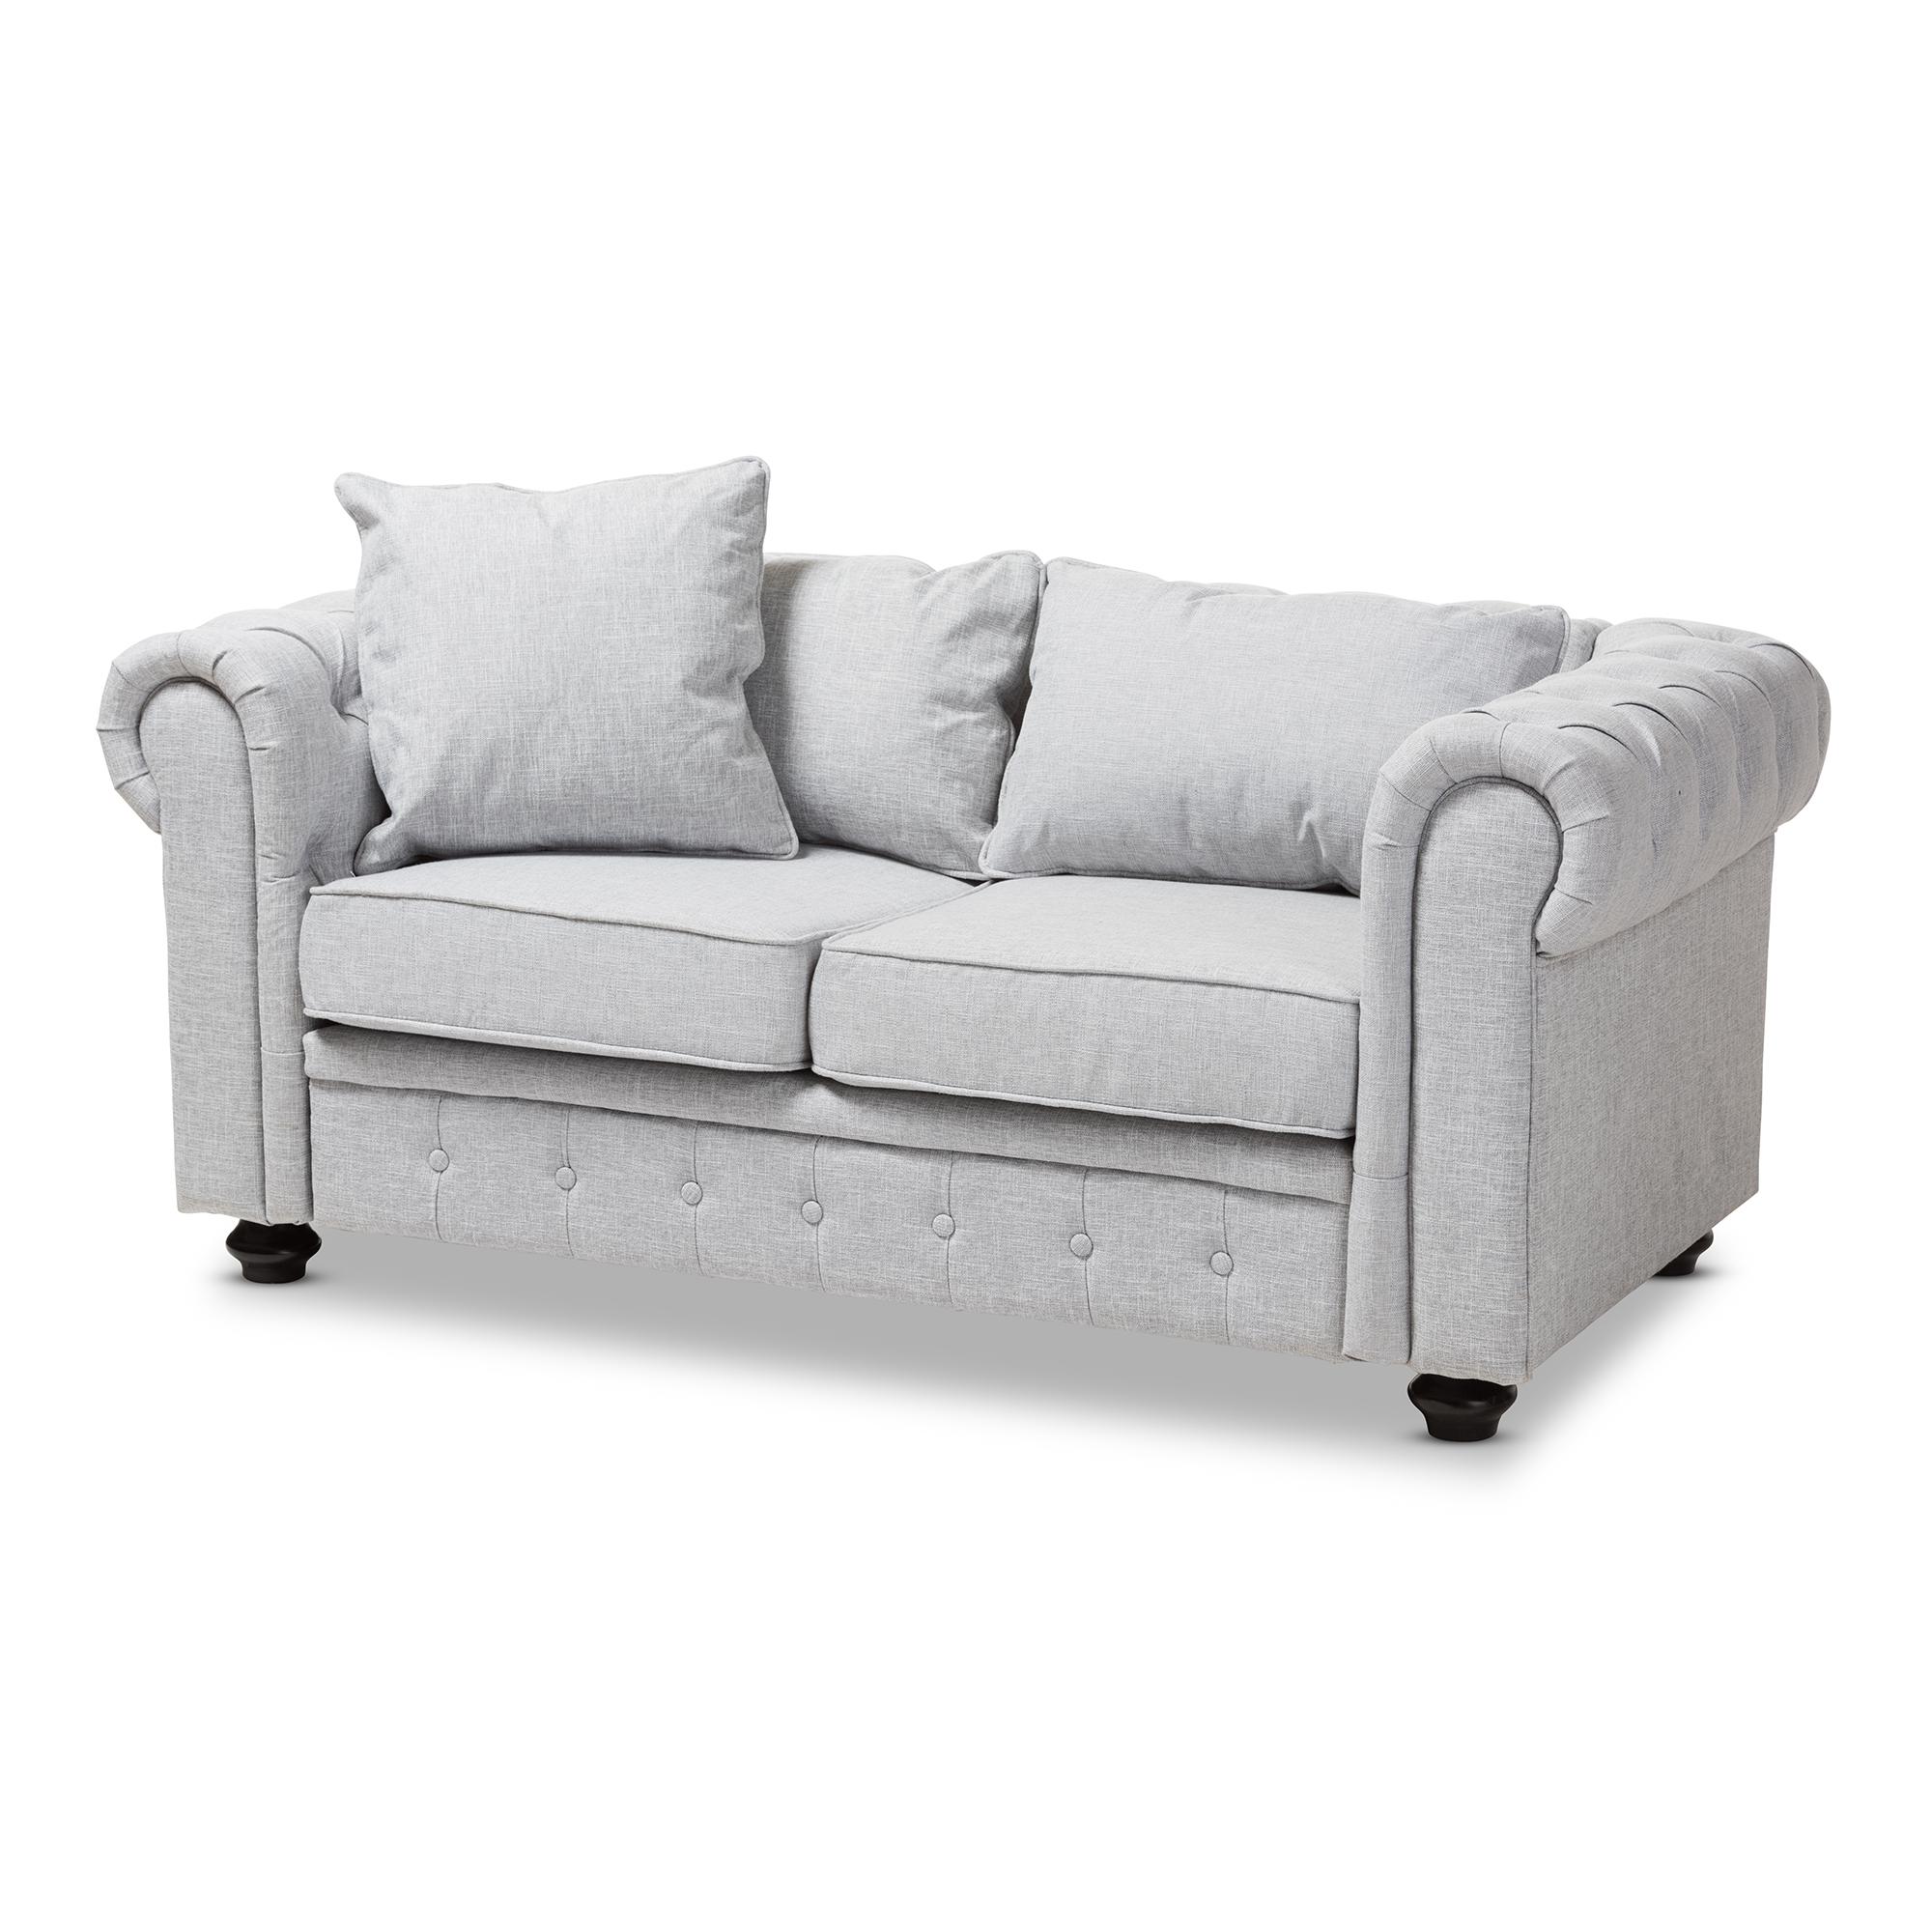 gray linen tufted sofa norwalk colton sectional baxton studio alaise modern classic grey